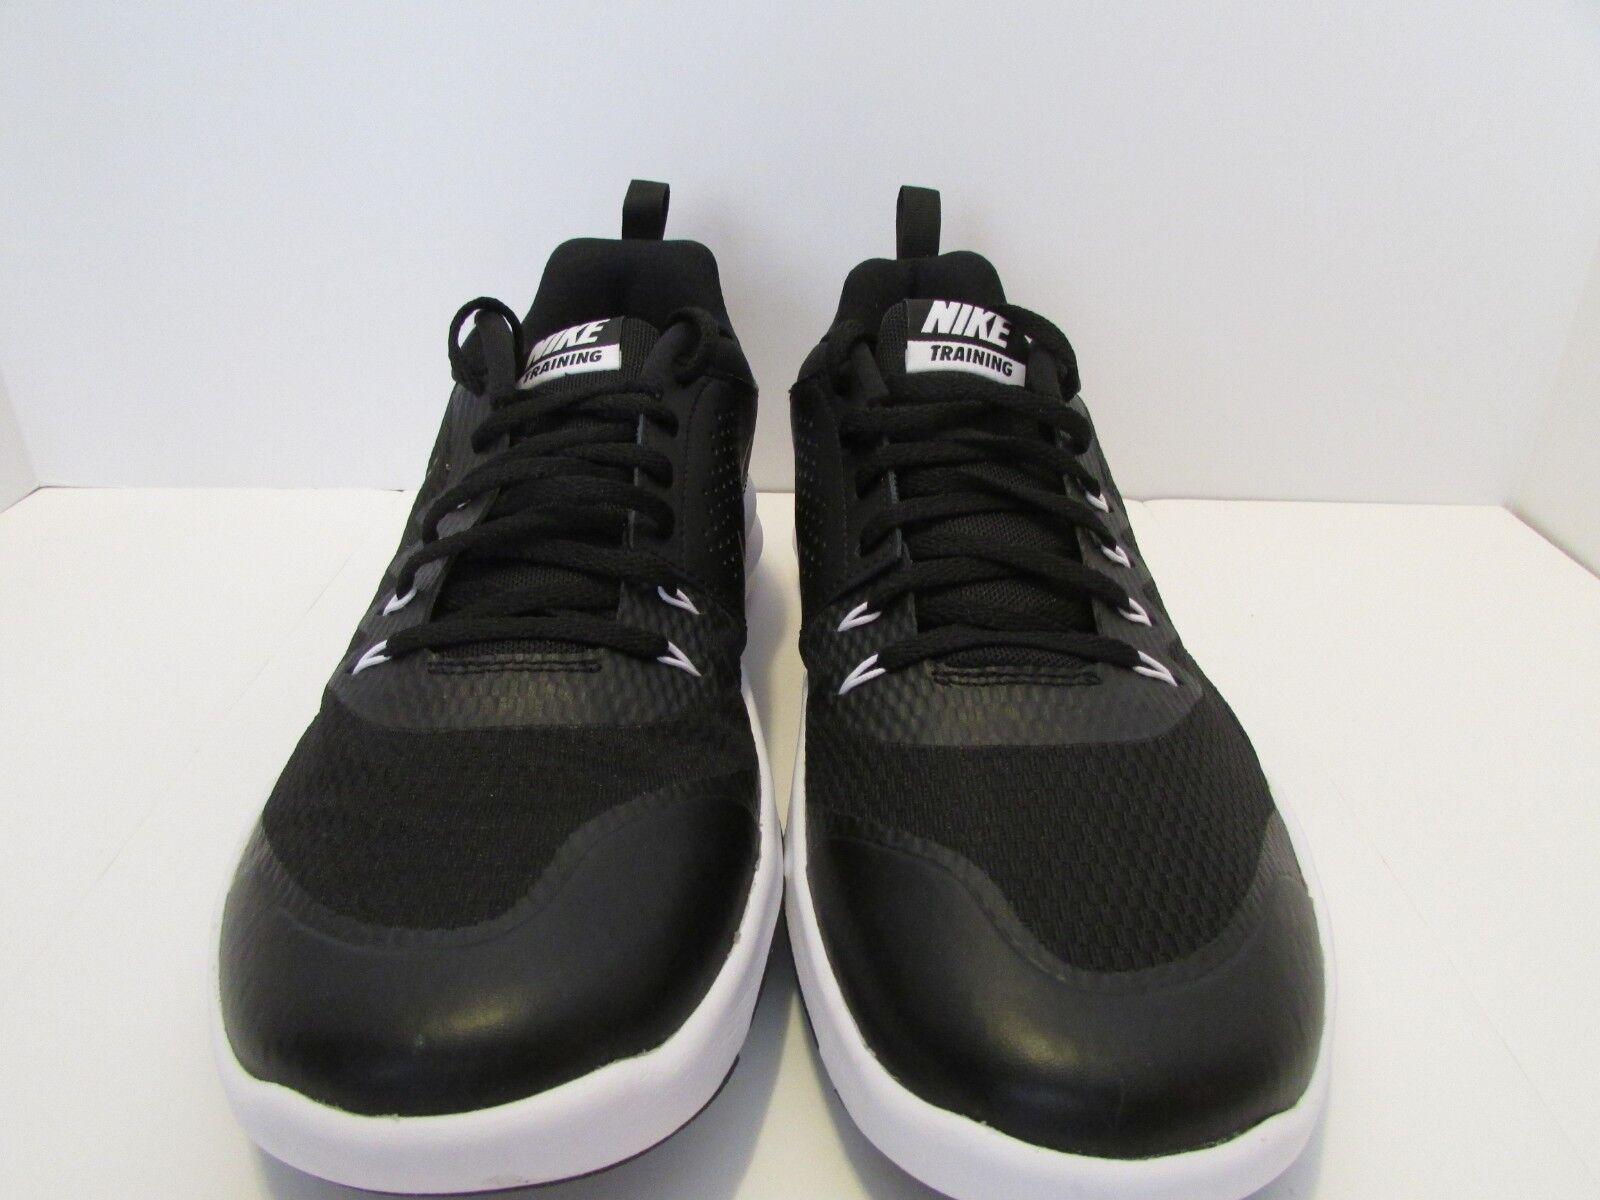 Nike Legend Trainer Men's Size 10 Black Metallic Silver